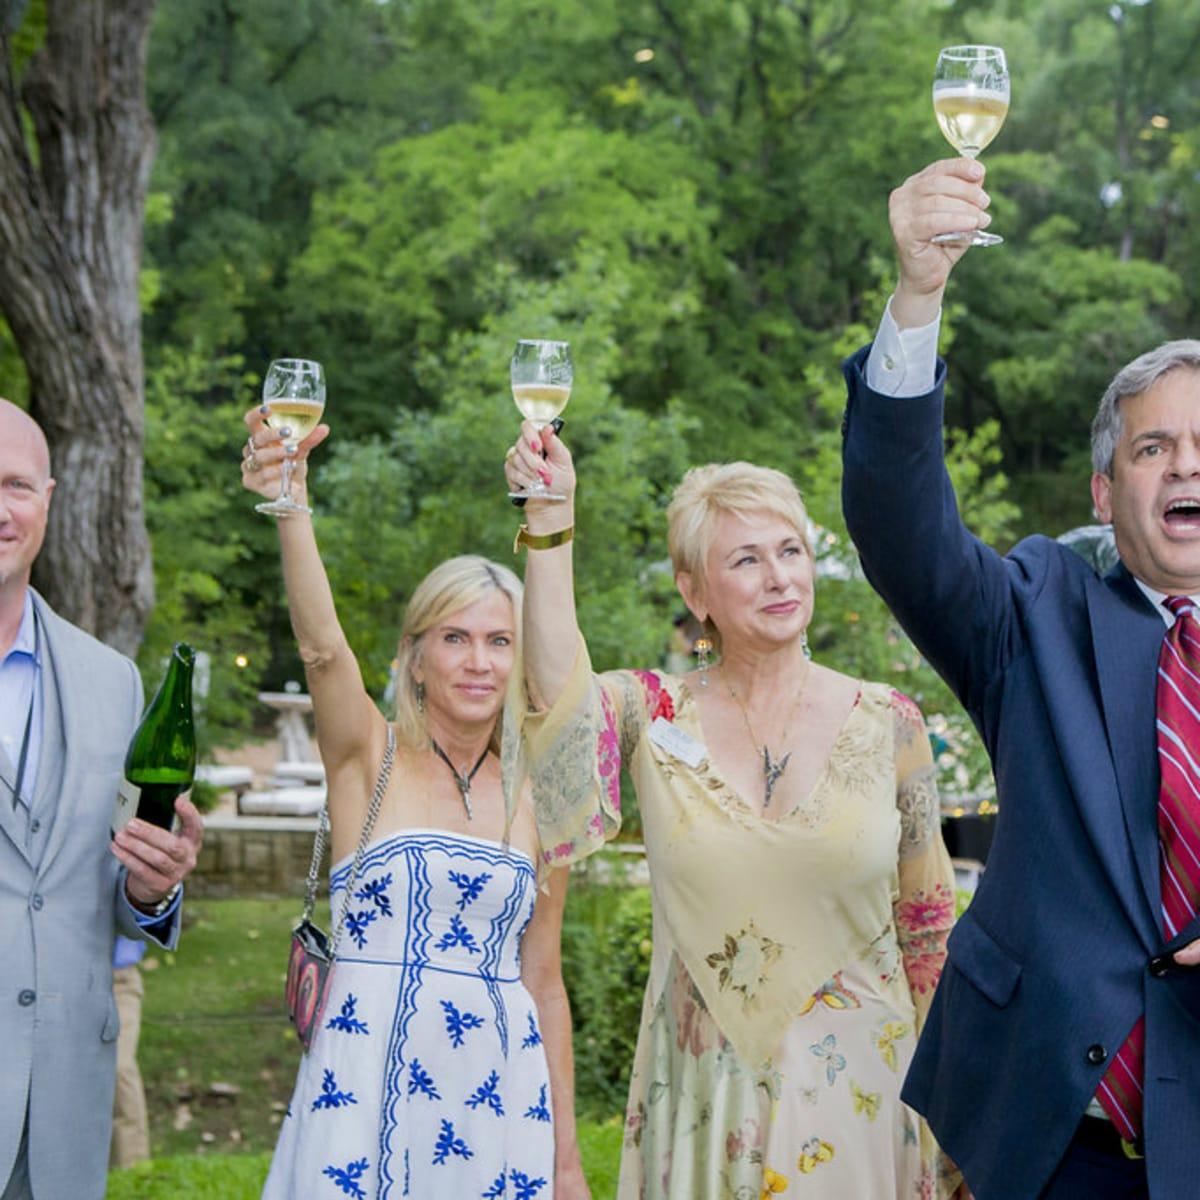 Umlauf Sculpture Garden and Museum Garden Party 2016 champagne toast Jon Gerber Leah Lee Nina Seely Mayor Steve Adler